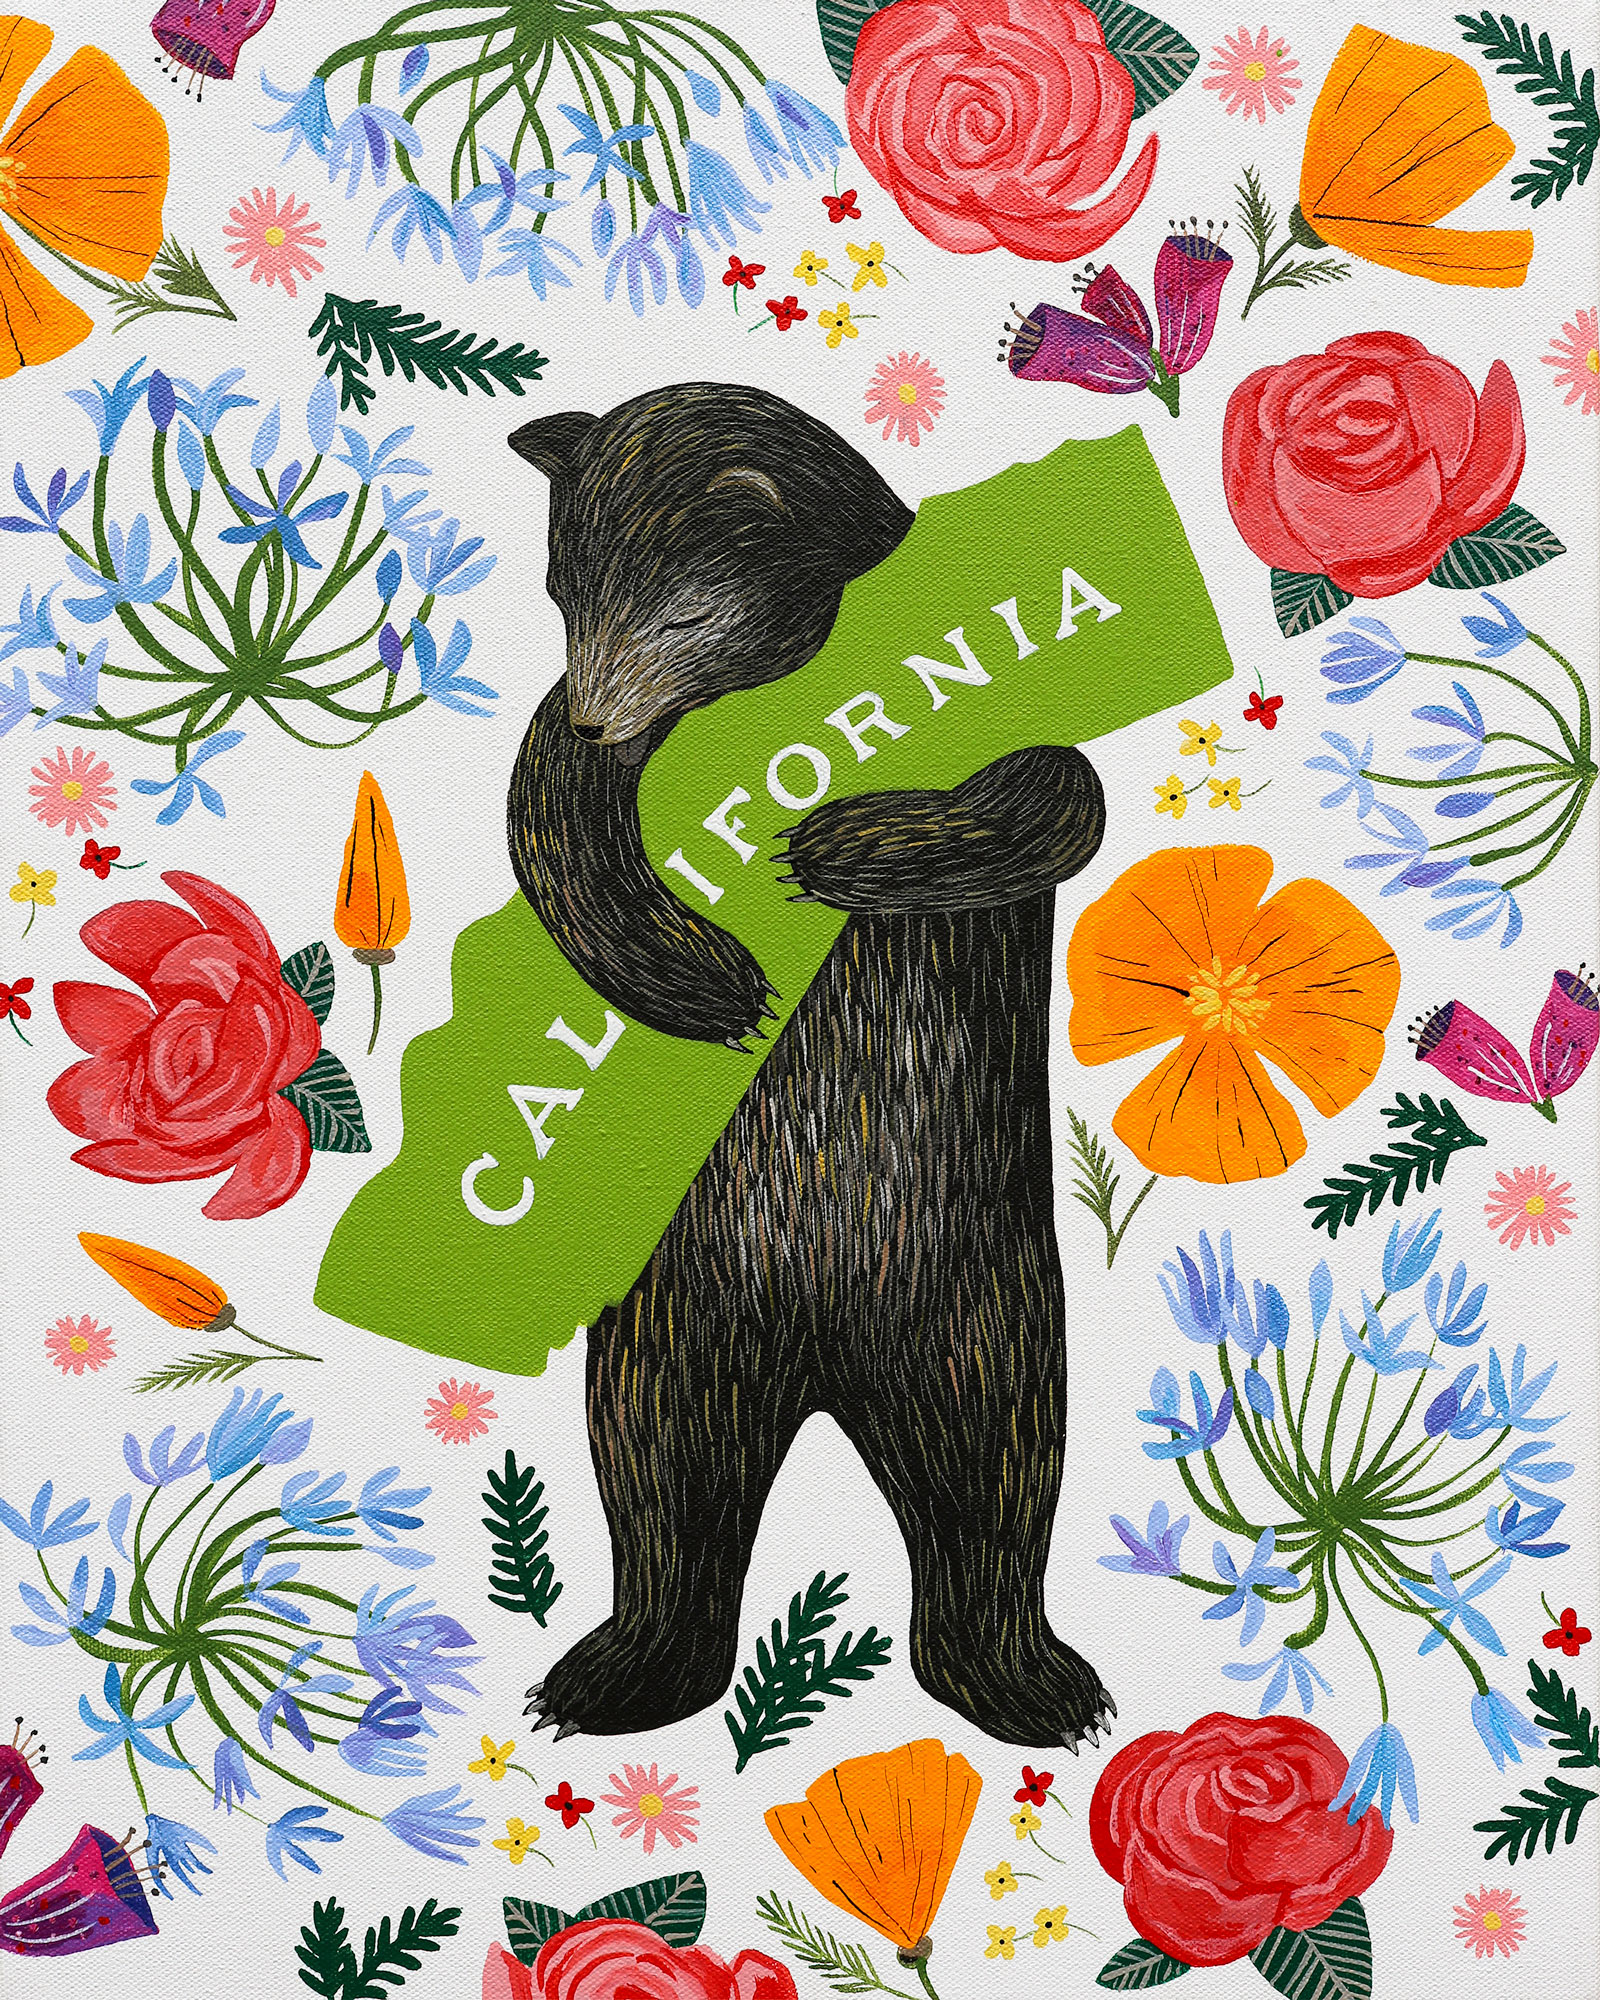 Sm Annie Galvin Botany Bear 40X32 Archival Print 2015